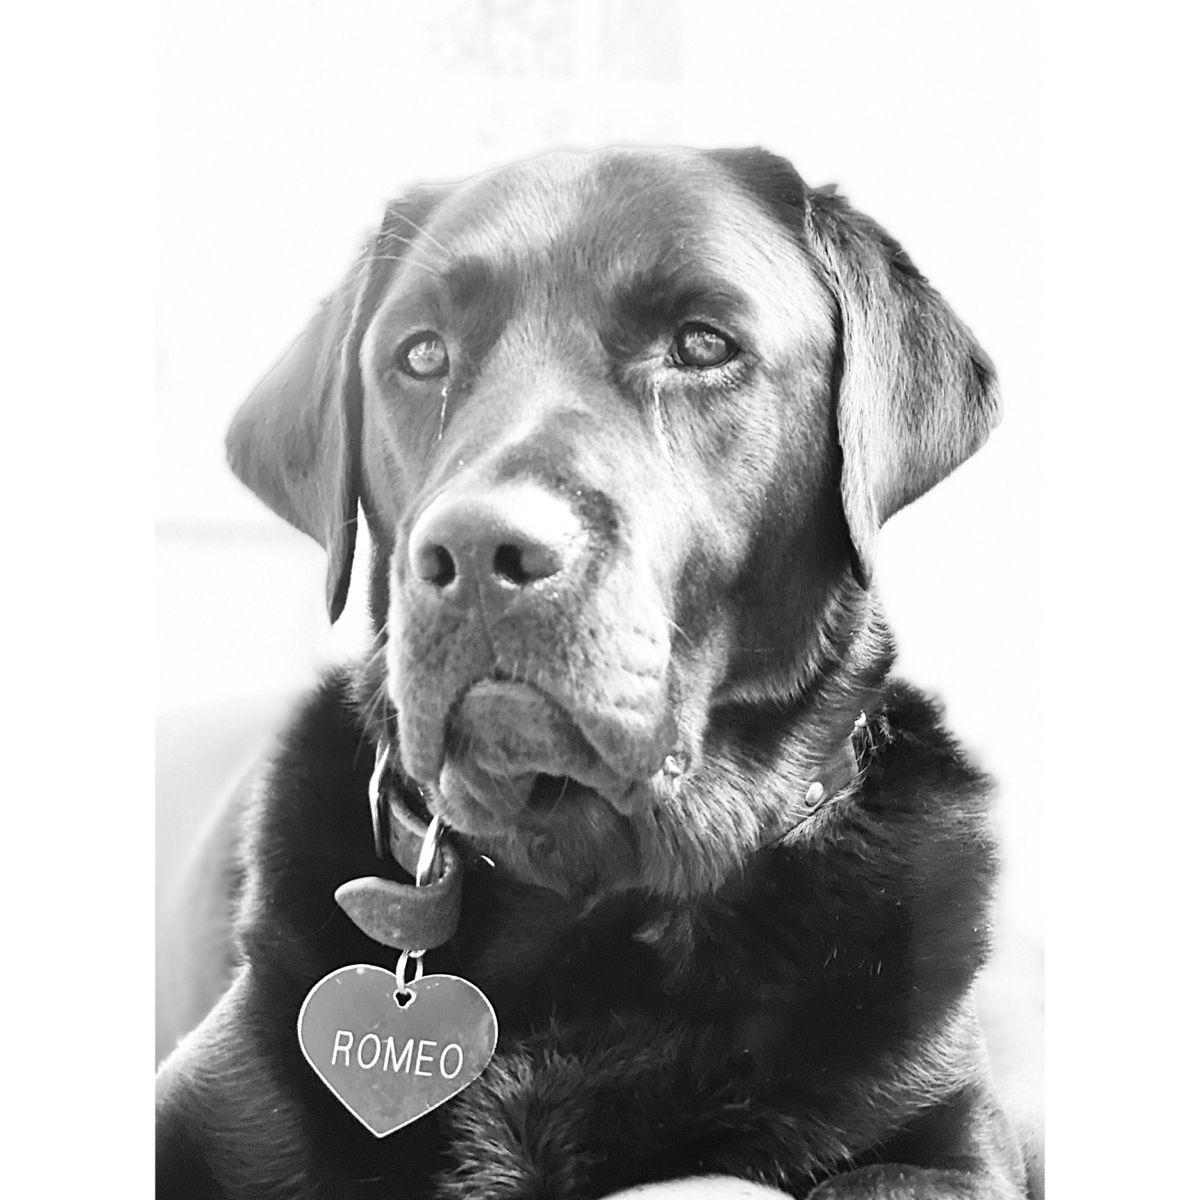 Romeo Oh Romeo In 2020 Dogs Animals Labrador Retriever